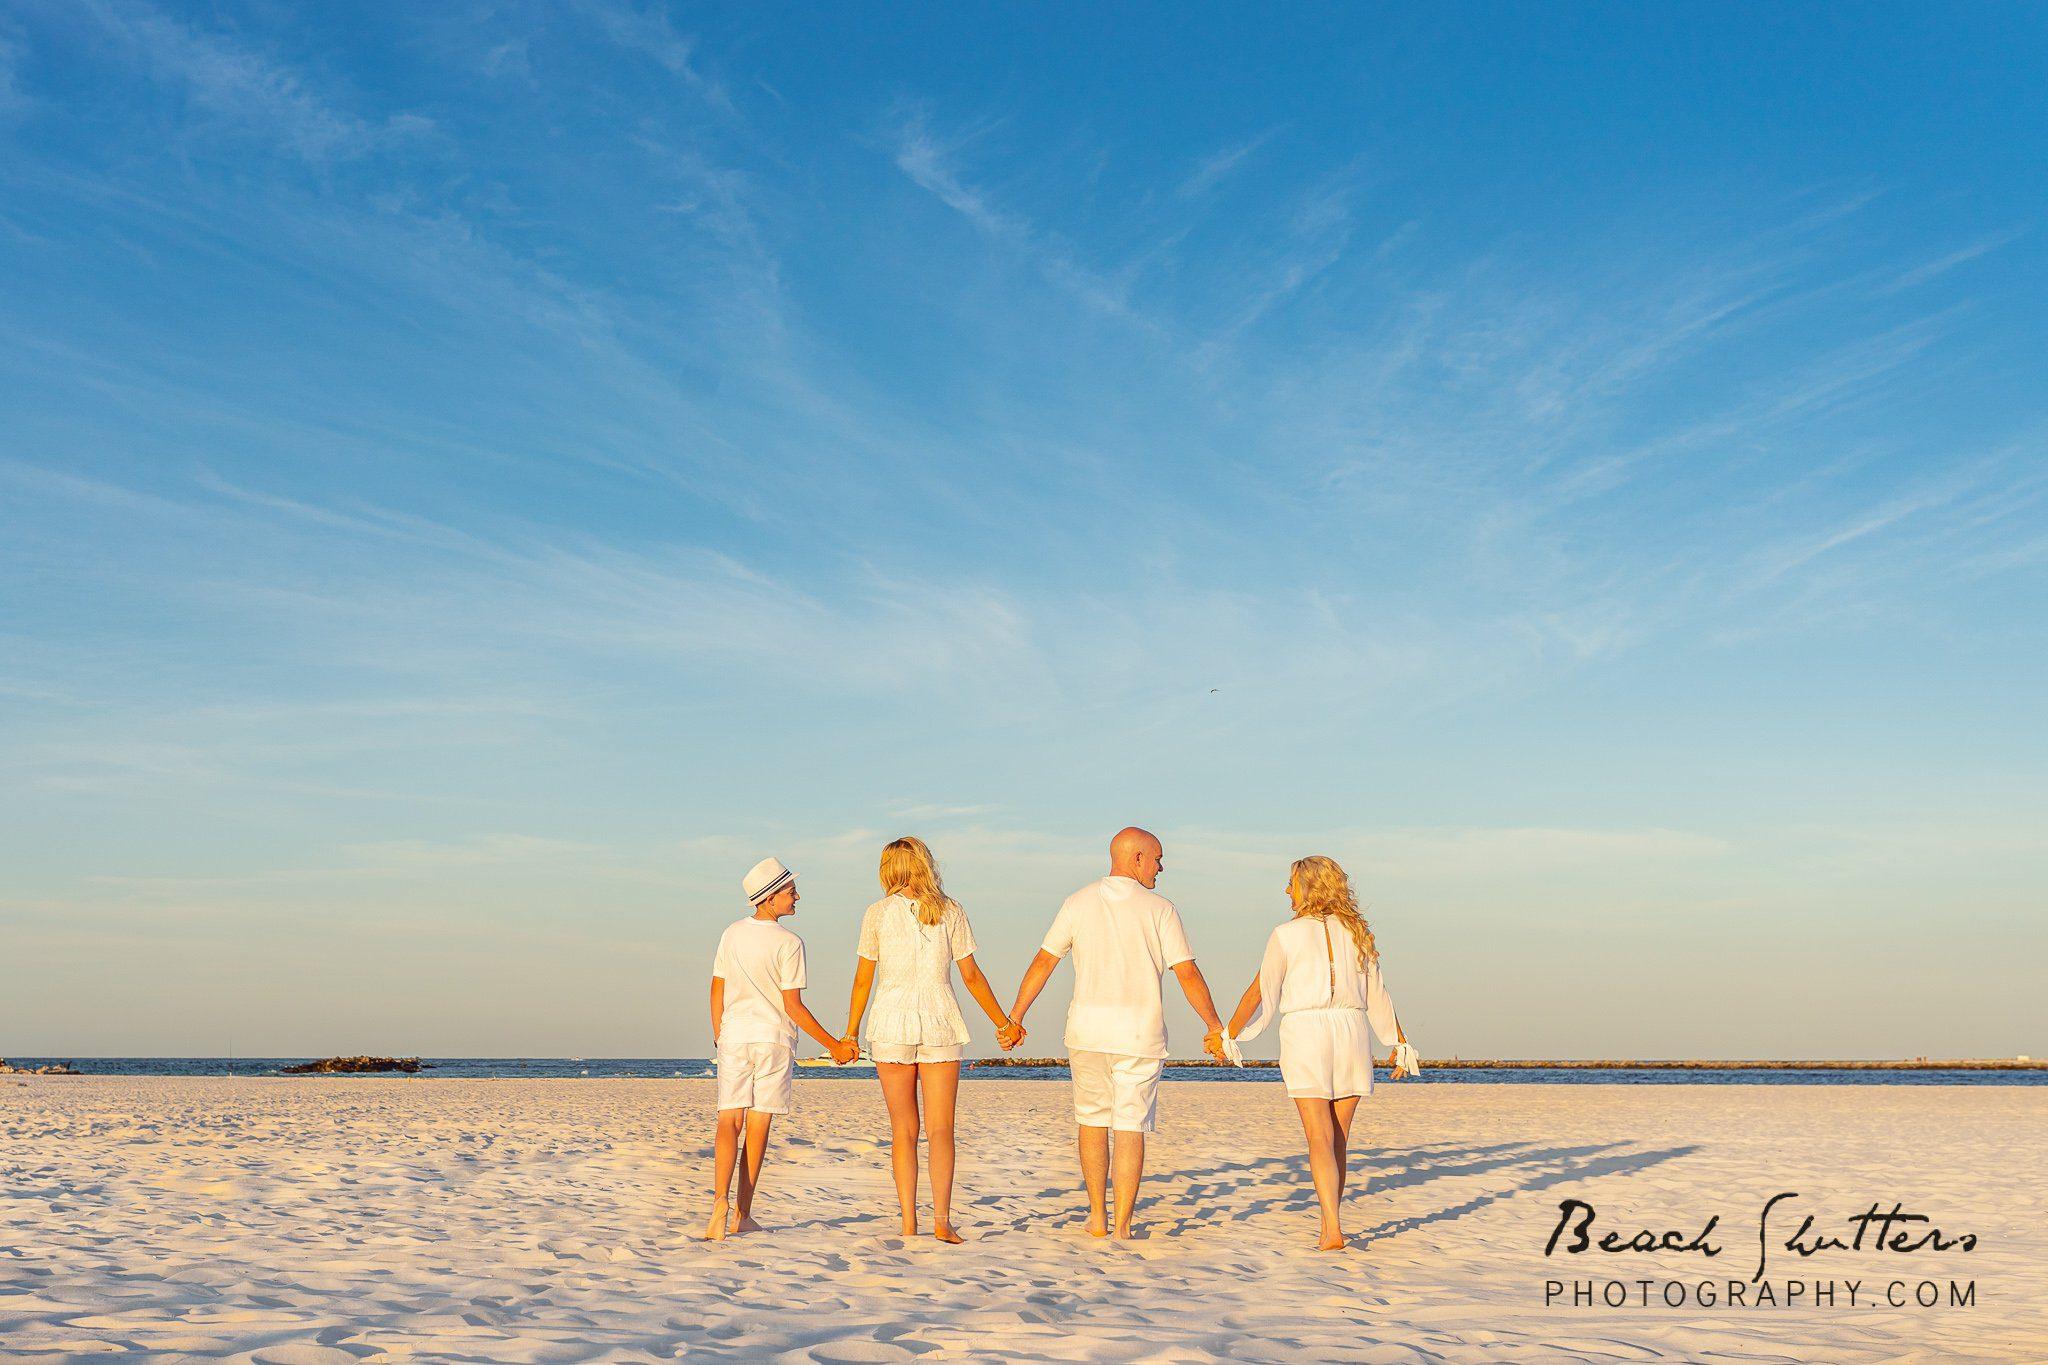 Beach Shutters Photography